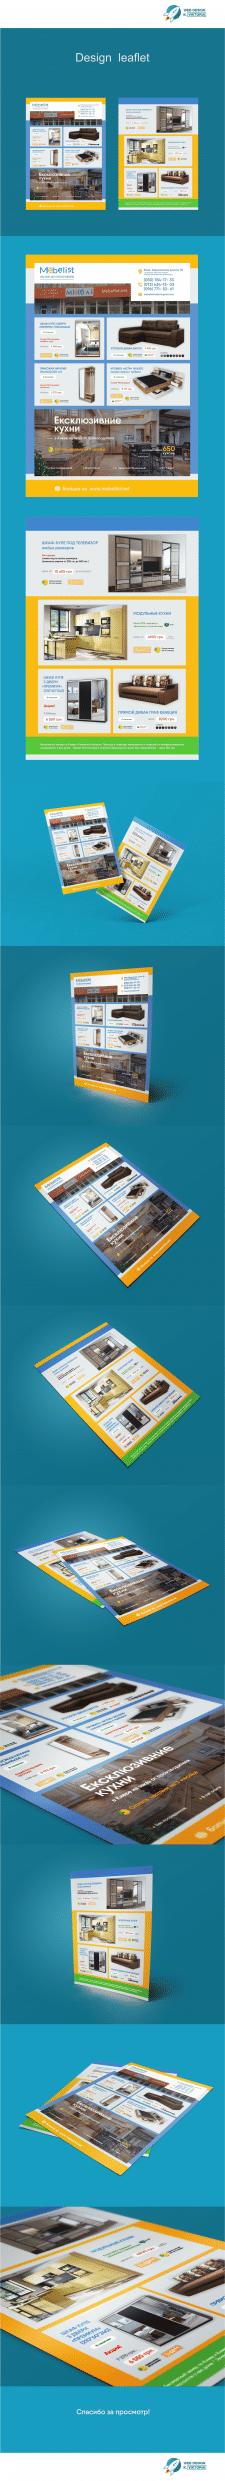 #Design flyers#